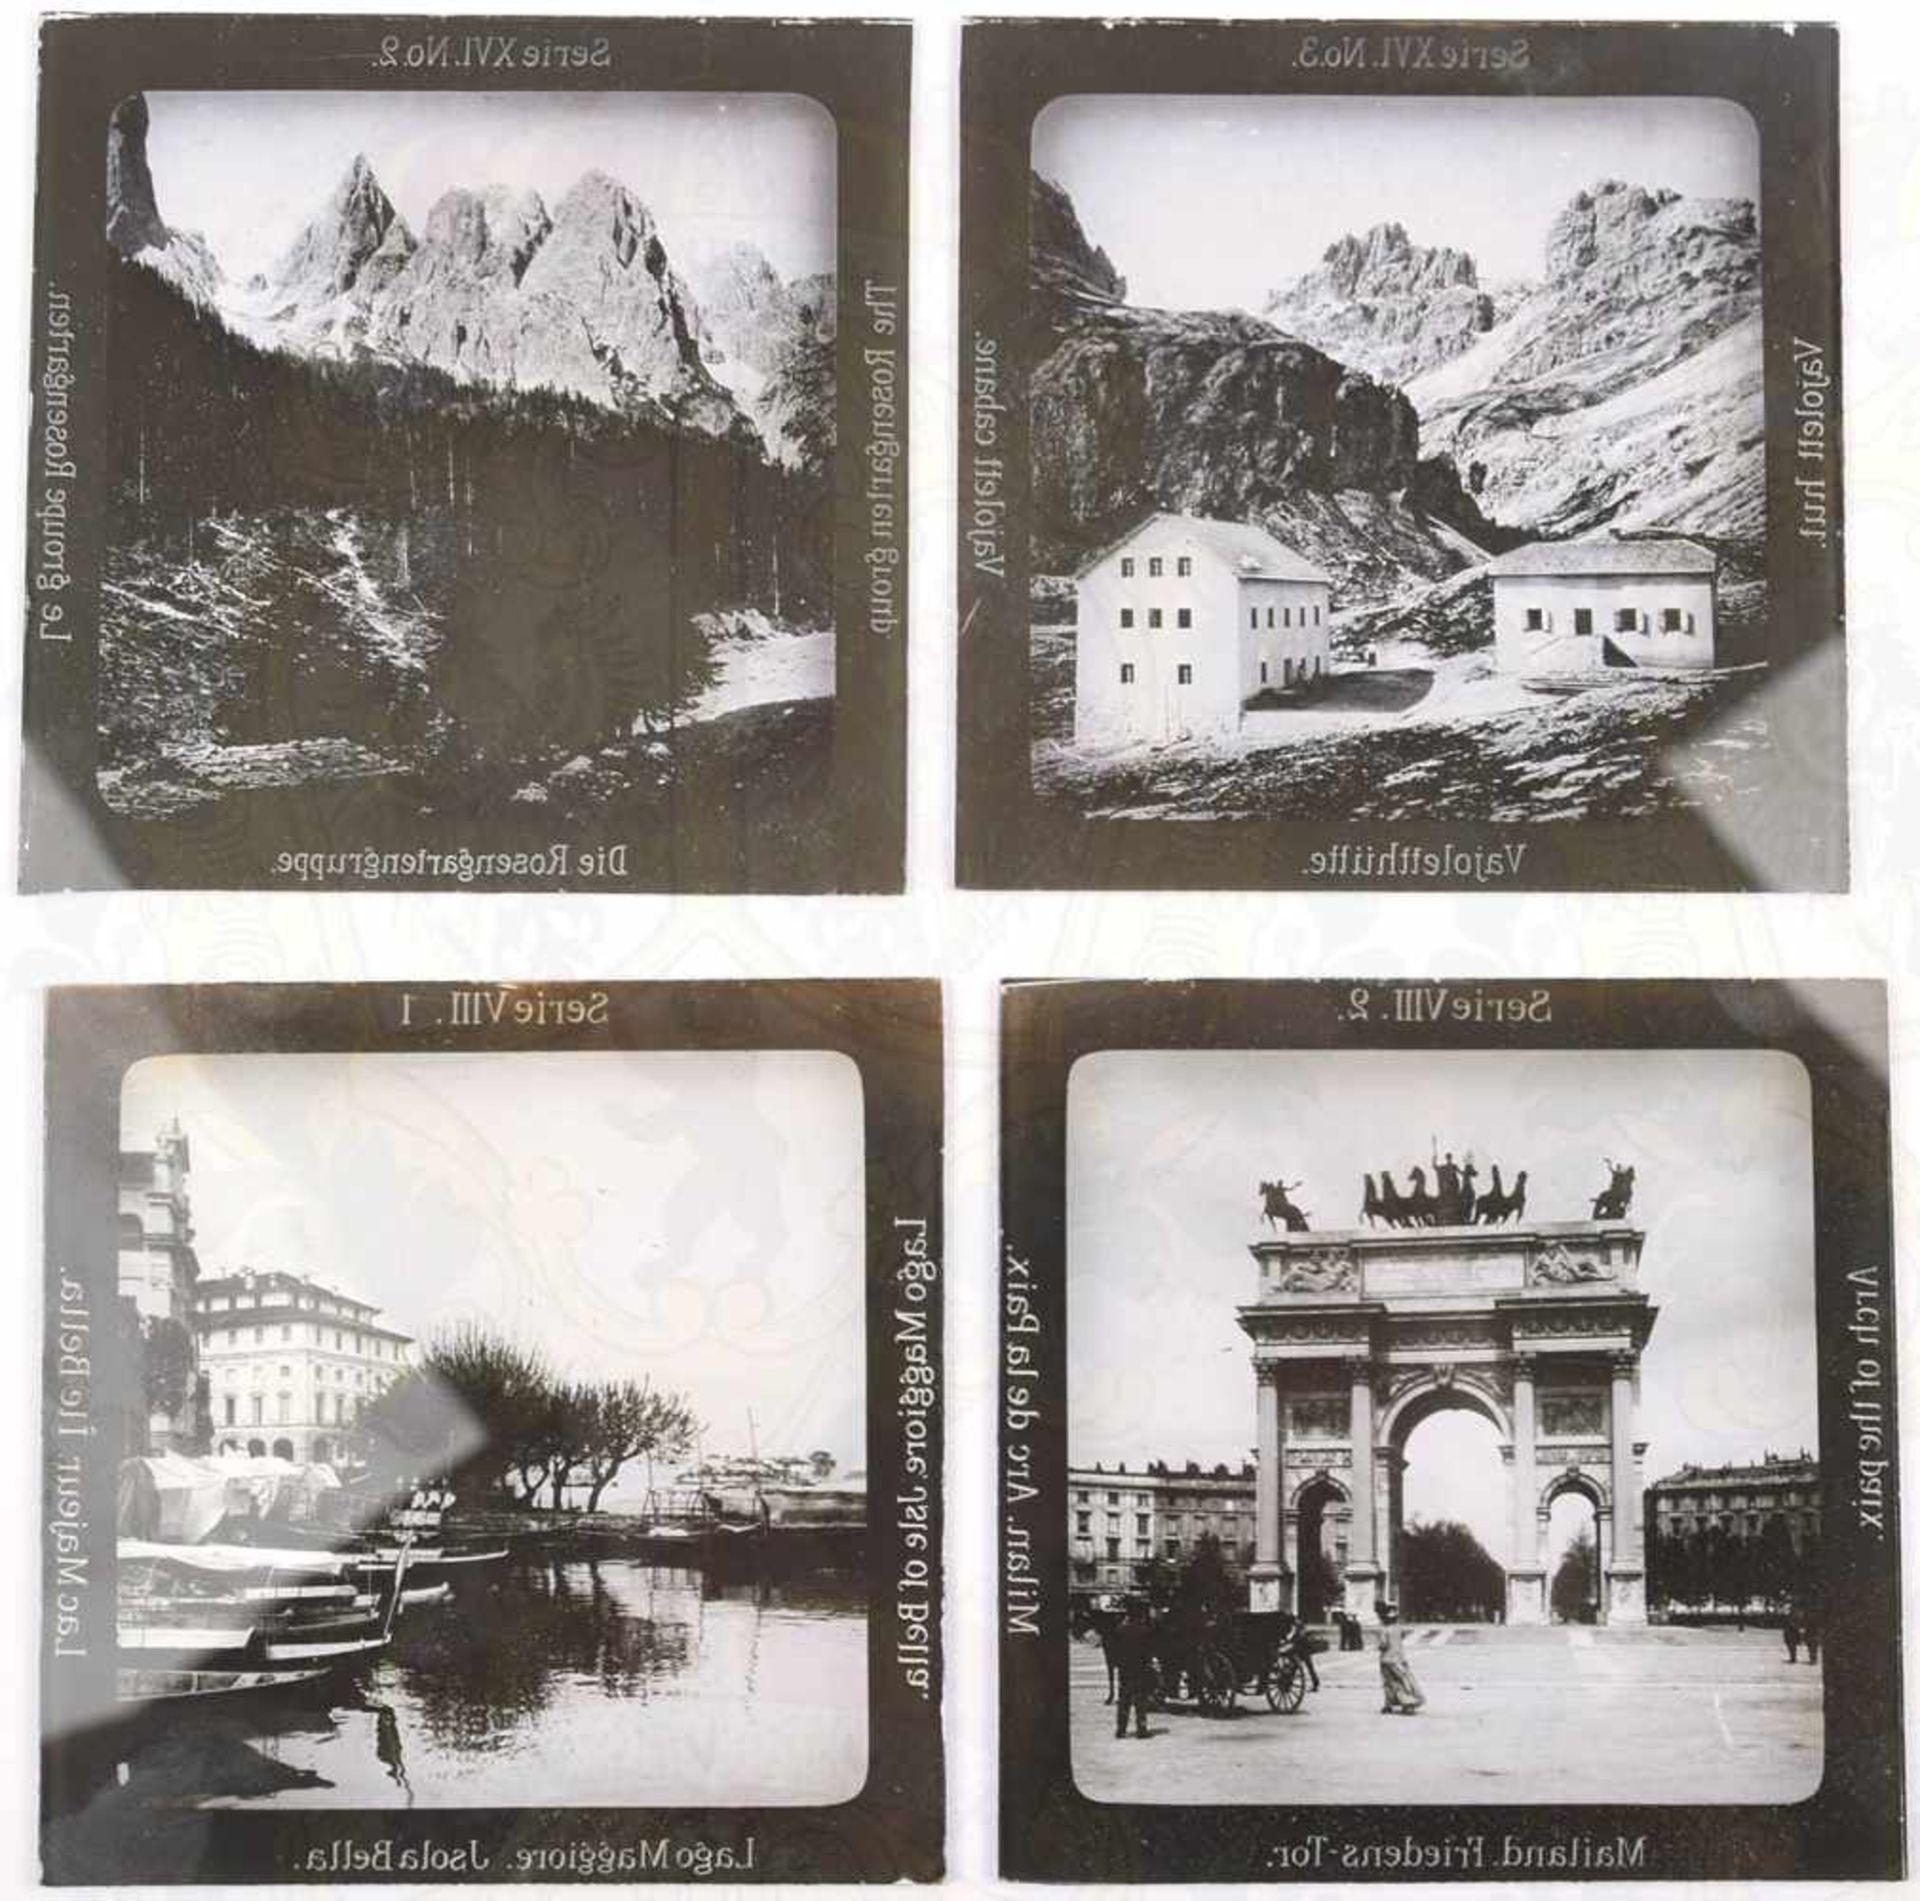 Los 60 - 45 GLASDIAS ITALIEN UND DOLOMITEN, Serie 8, St. Markuskirche v. Venedig, Rialto Brücke, Friedens Tor